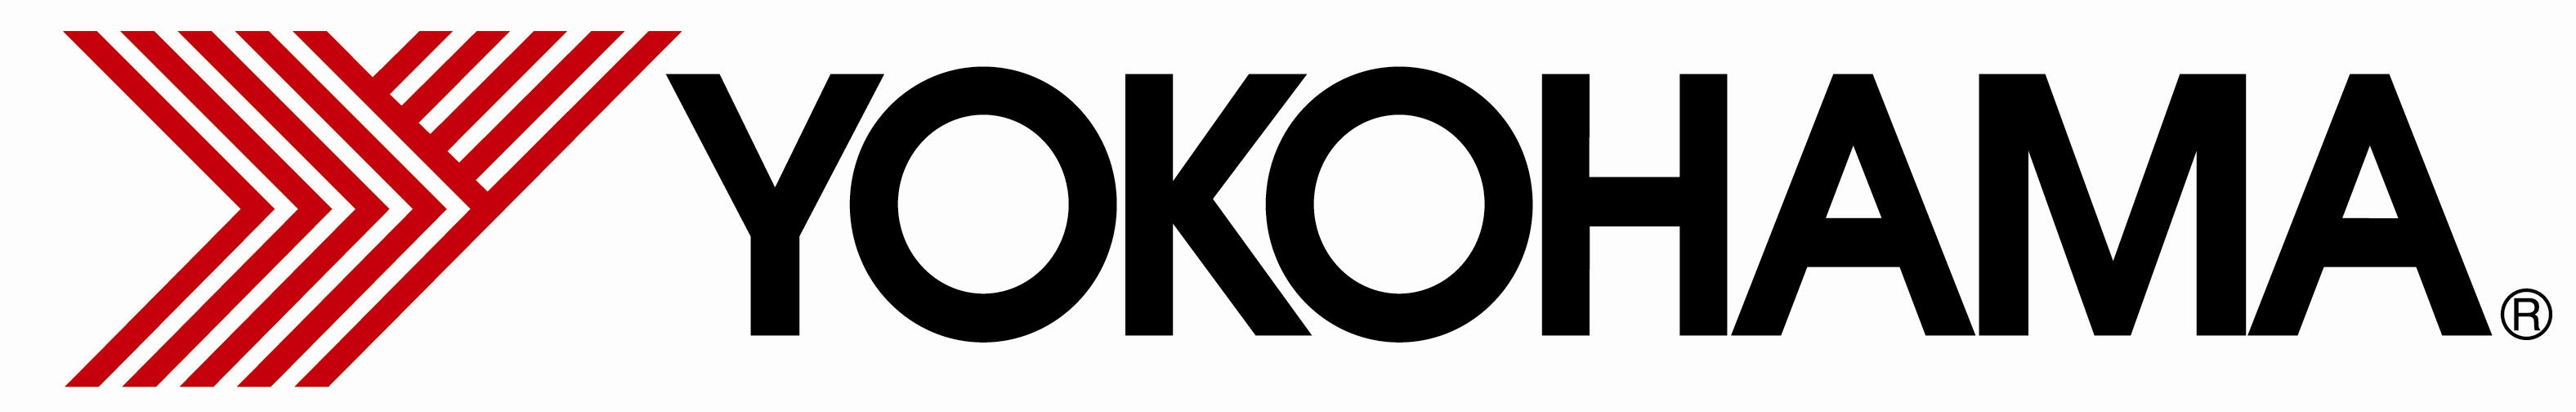 Yokohama-Tires-Logo